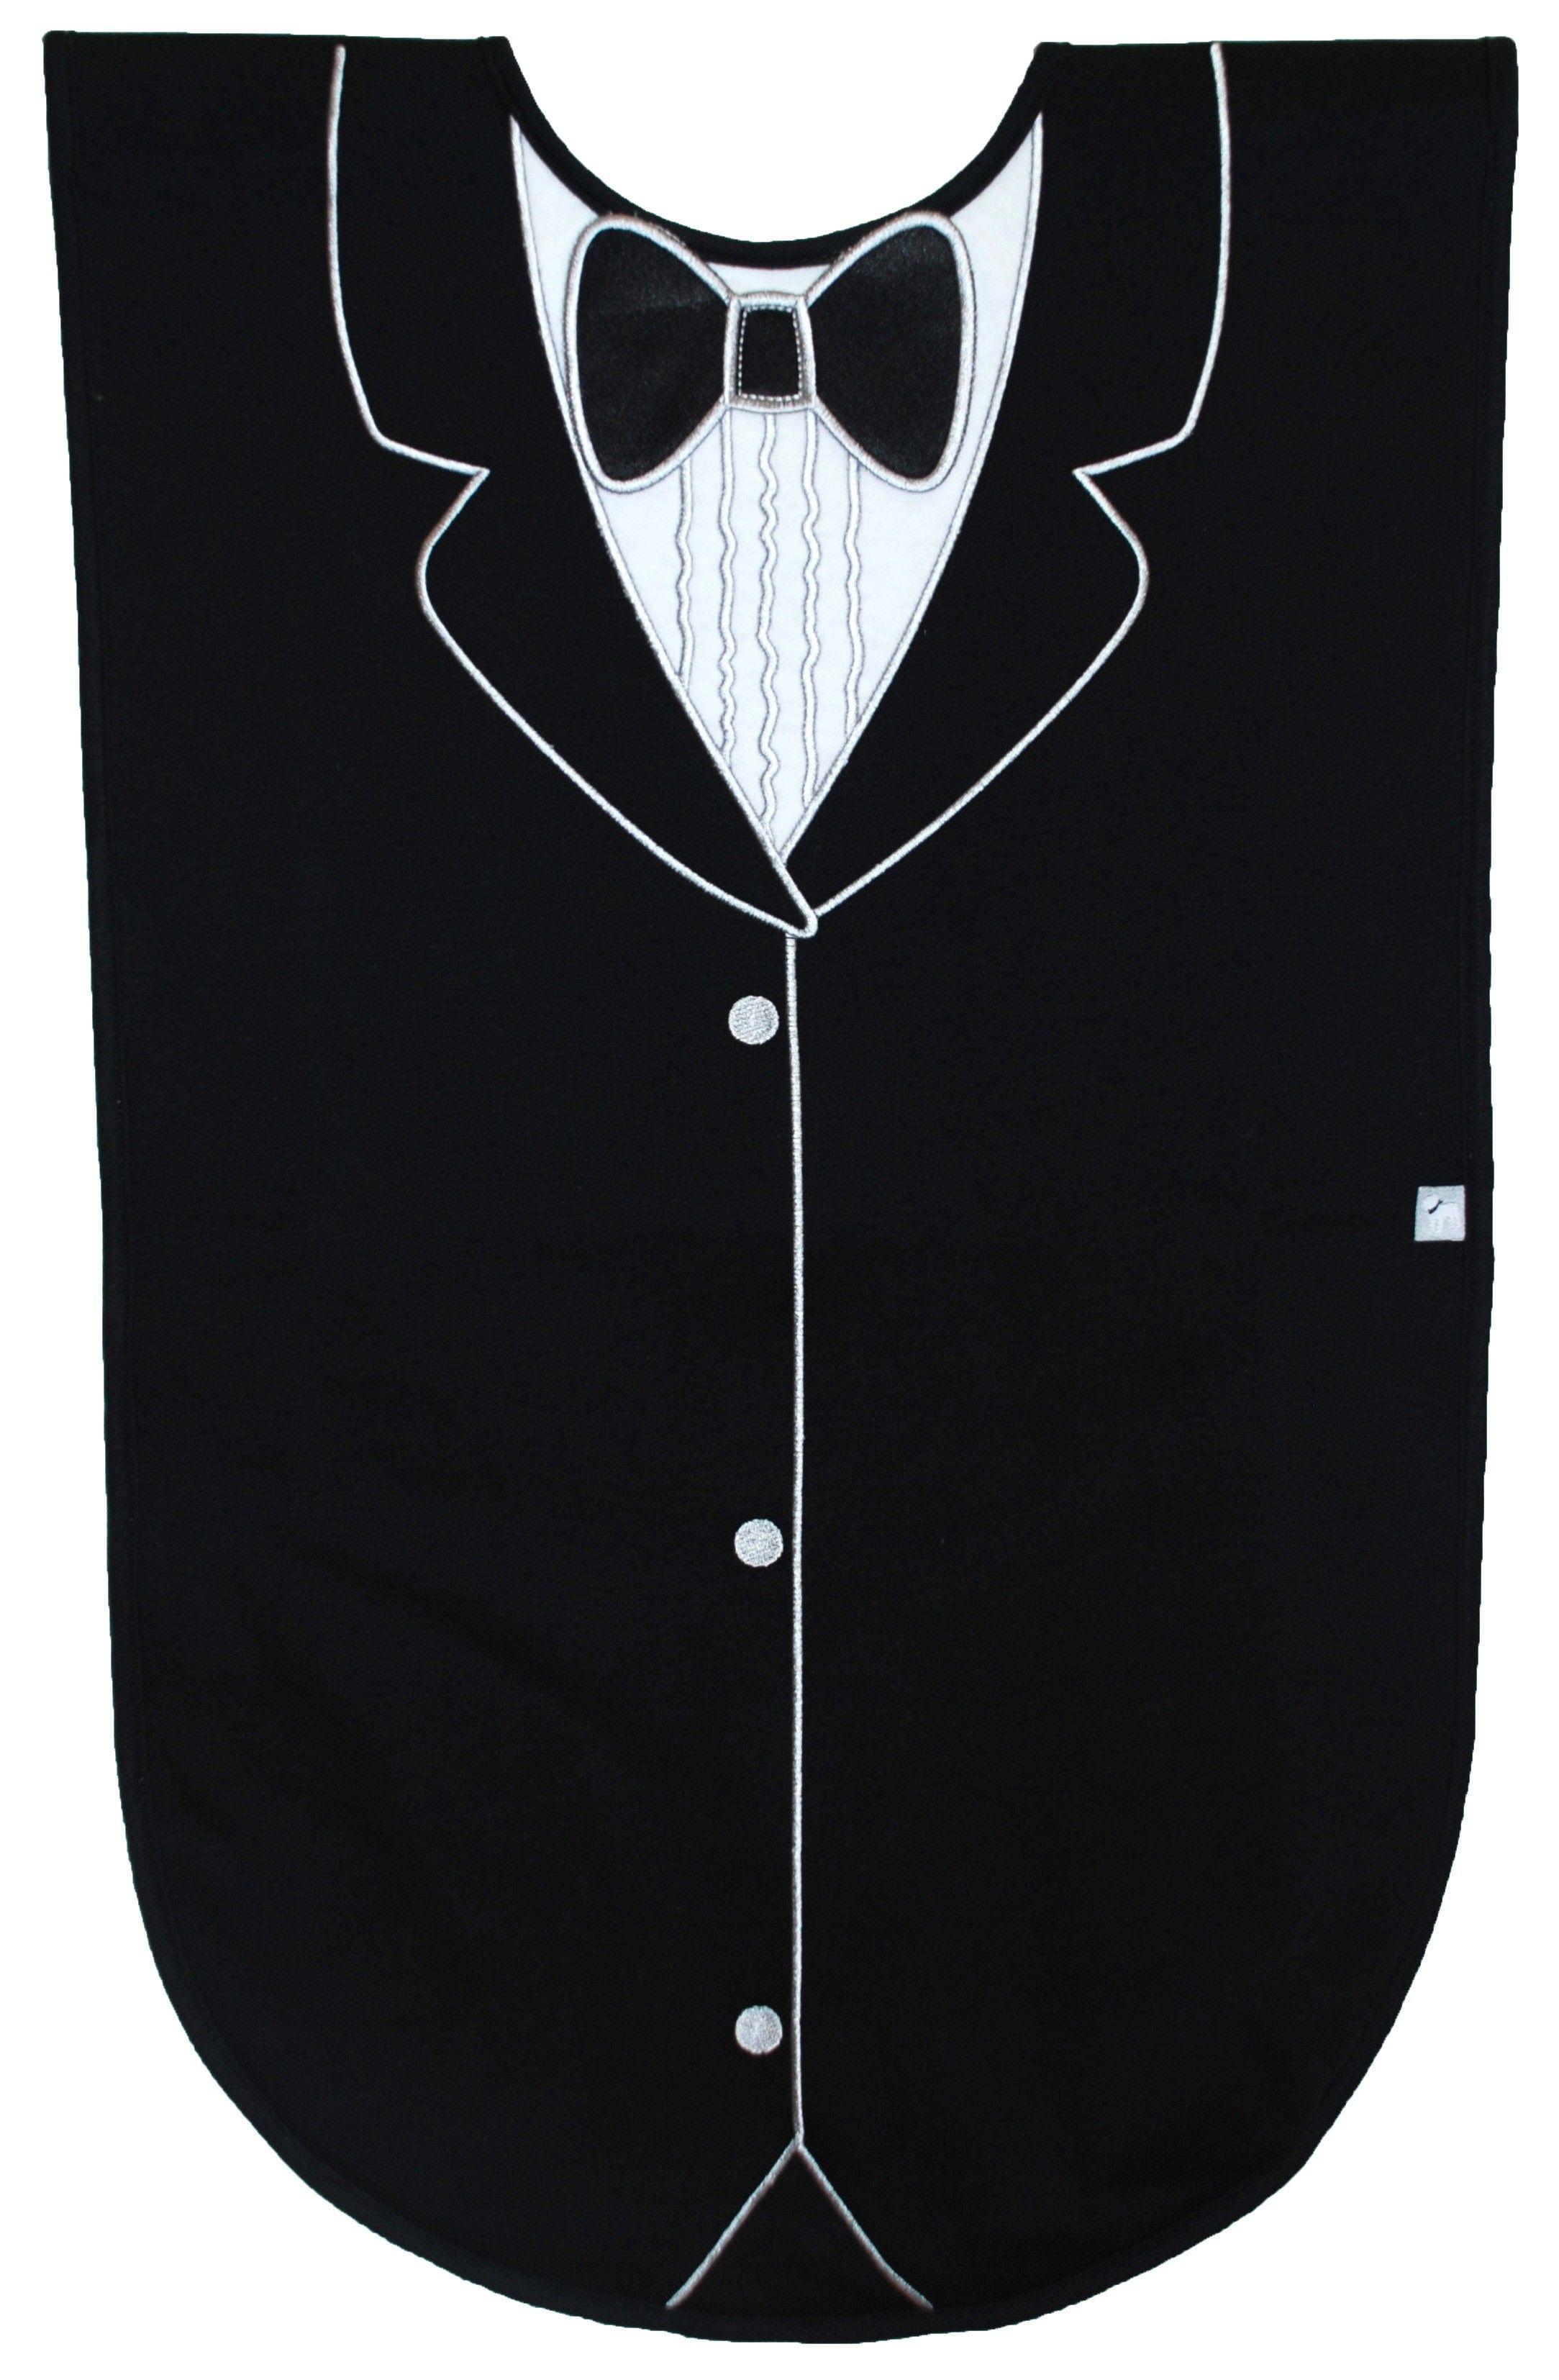 Black Tuxedo Adult Bib Sewing Pinterest